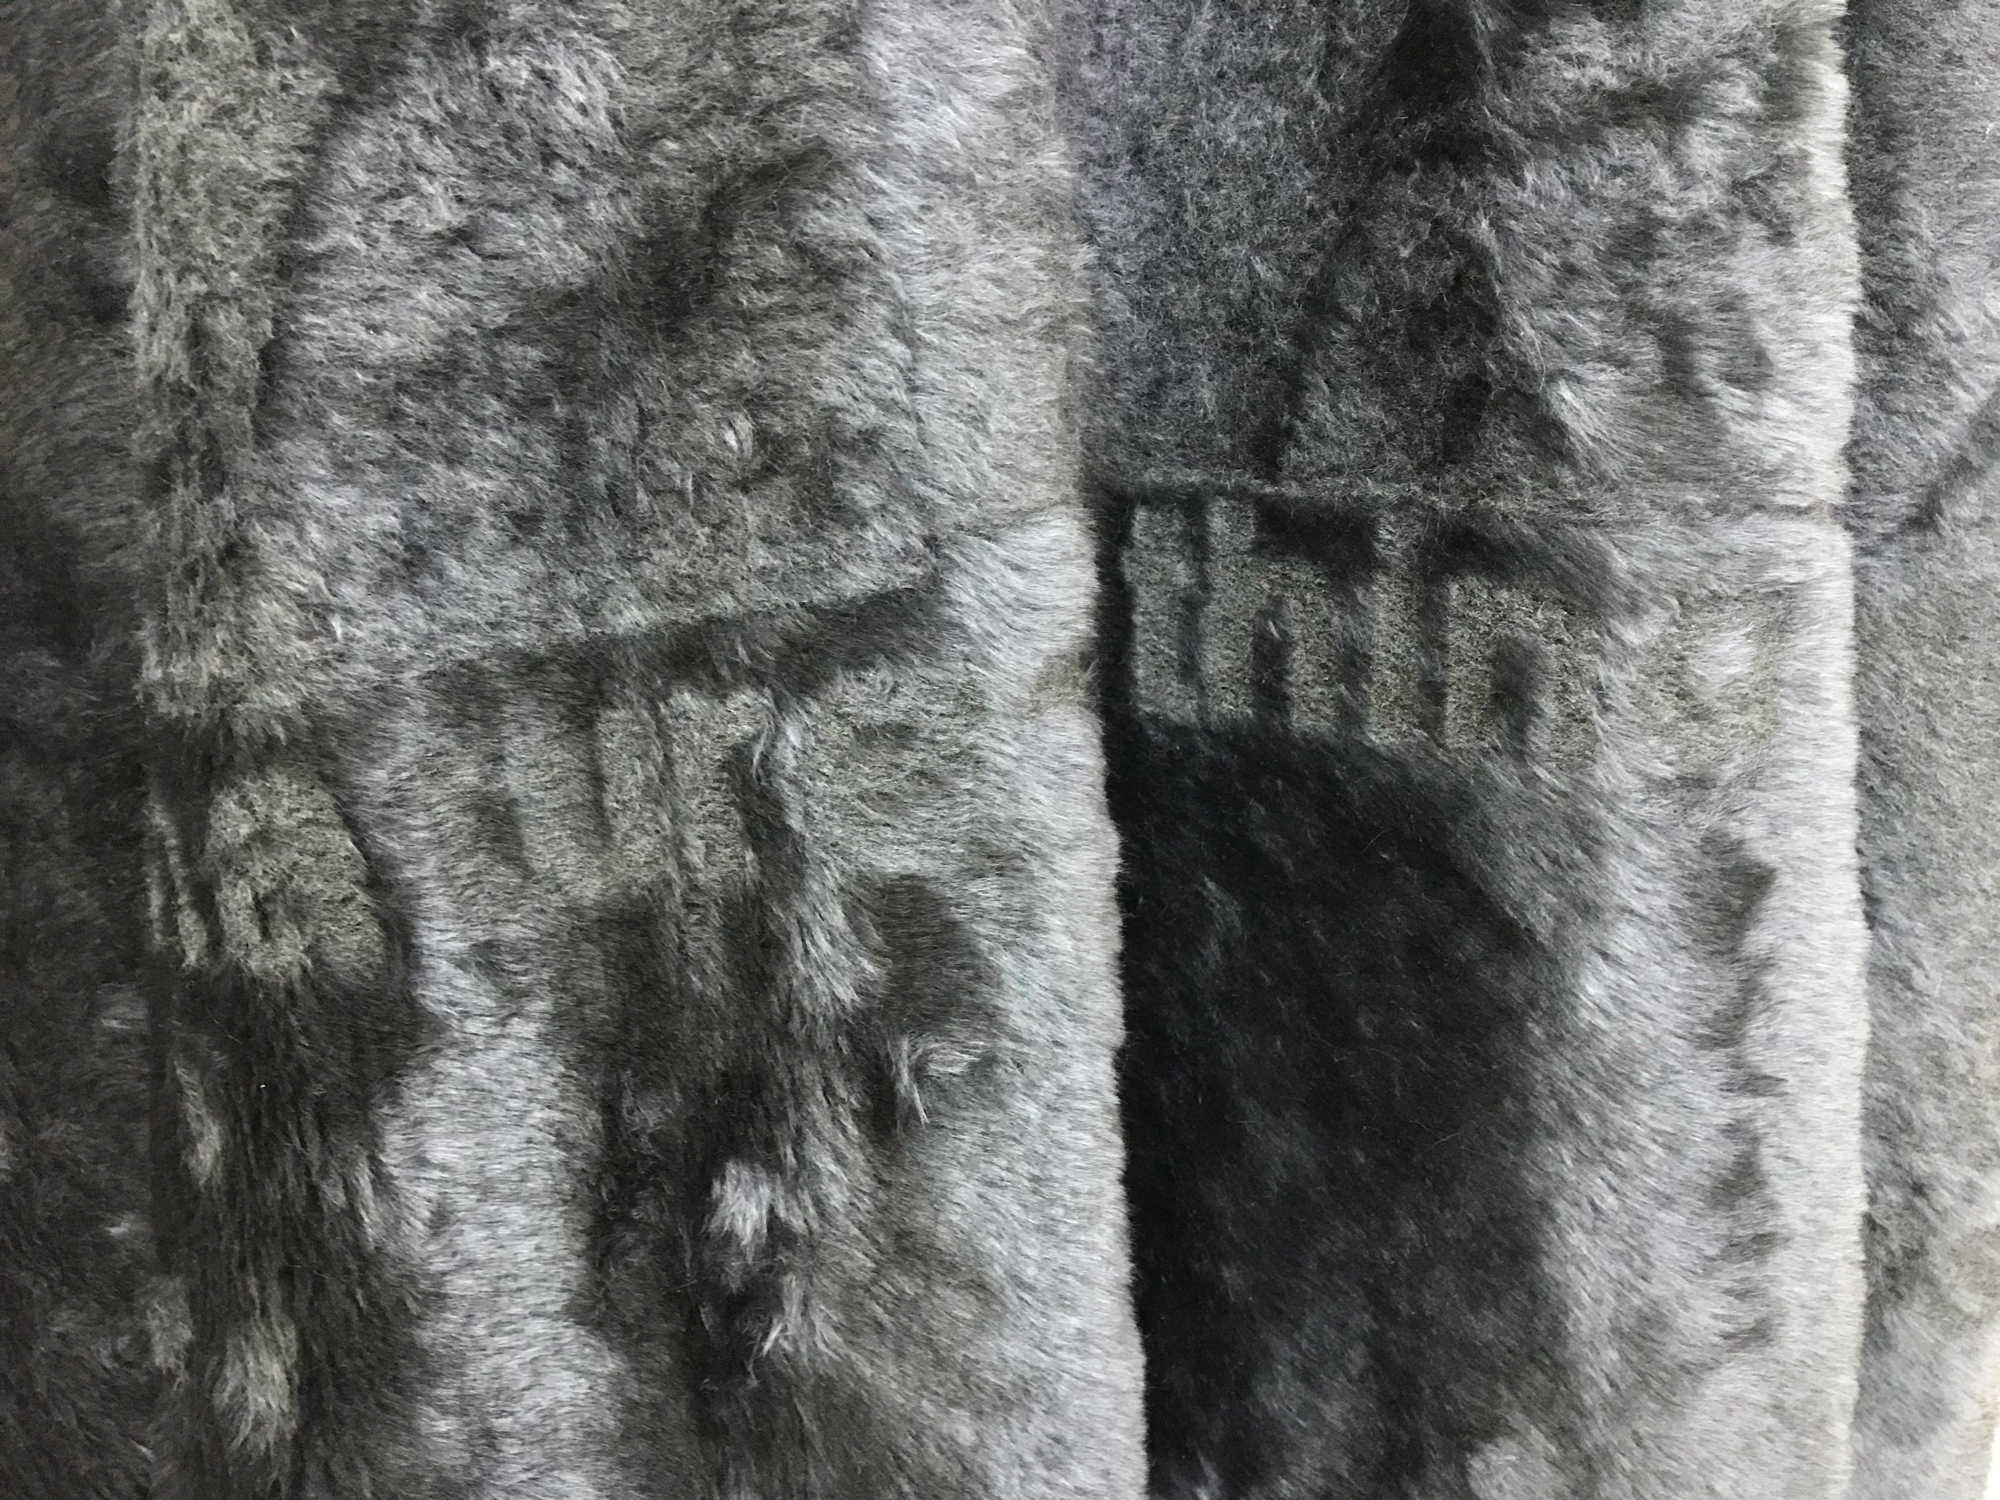 Valinia Svoronou,  Dense Coat Configuration